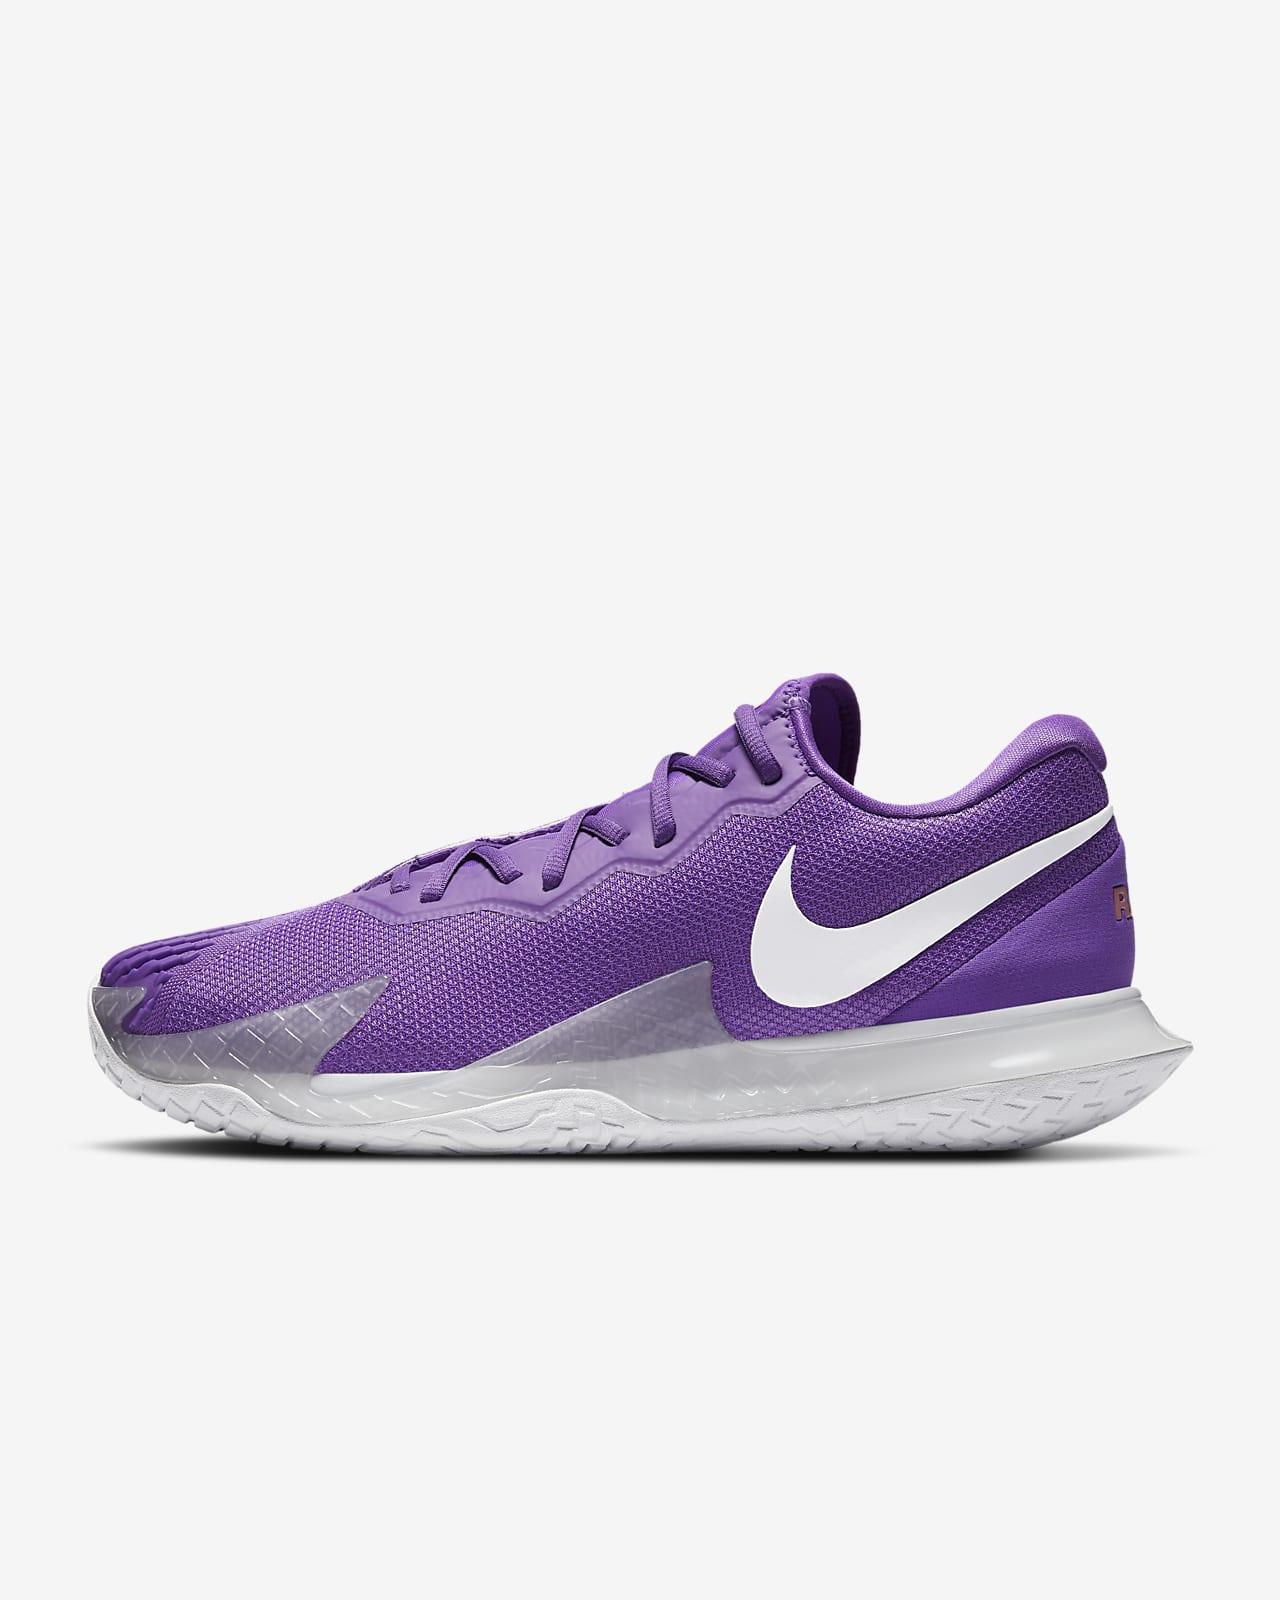 NikeCourt Zoom Vapor Cage 4 Rafa Men's Hard Court Tennis Shoe